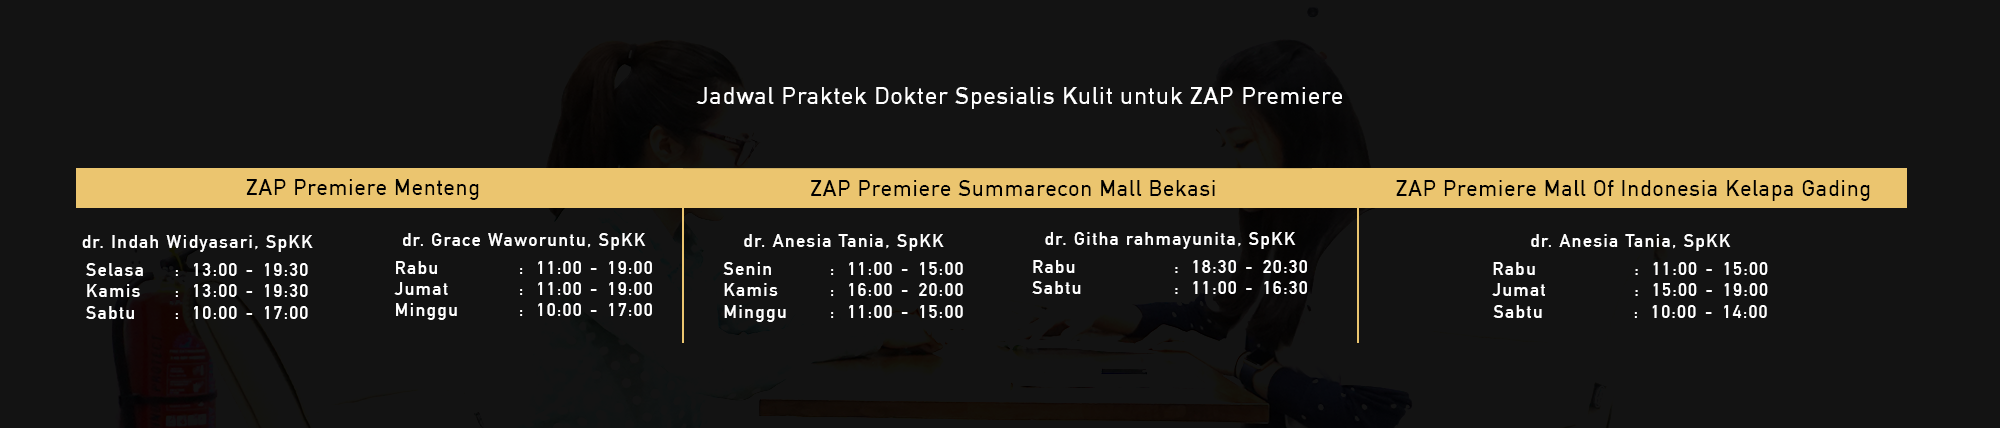 Jadwal Dokter ZAP Premiere